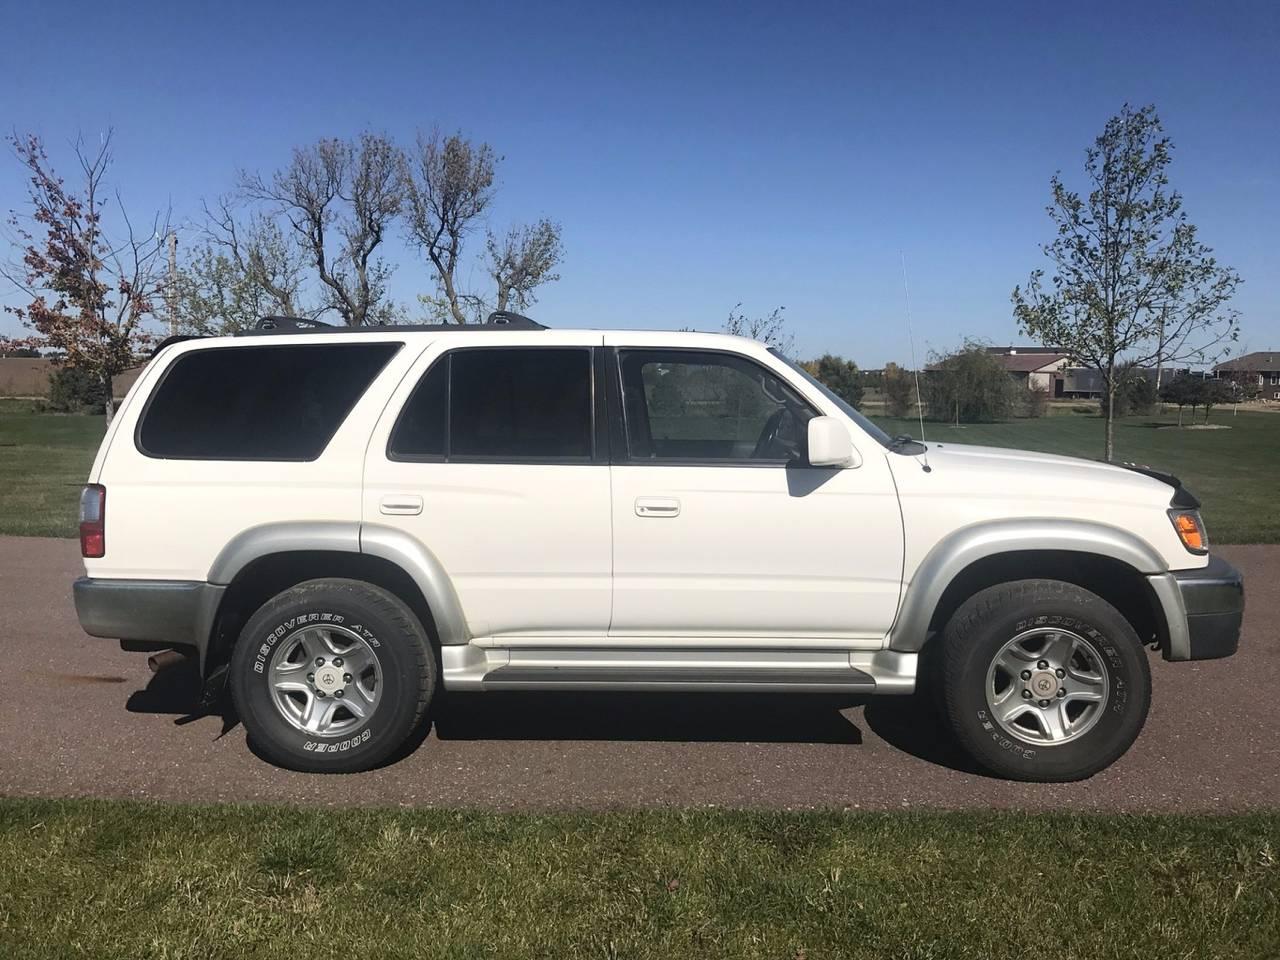 2001 Toyota 4Runner SR5 | Sioux Falls, SD, Natural White (White), 4 Wheel